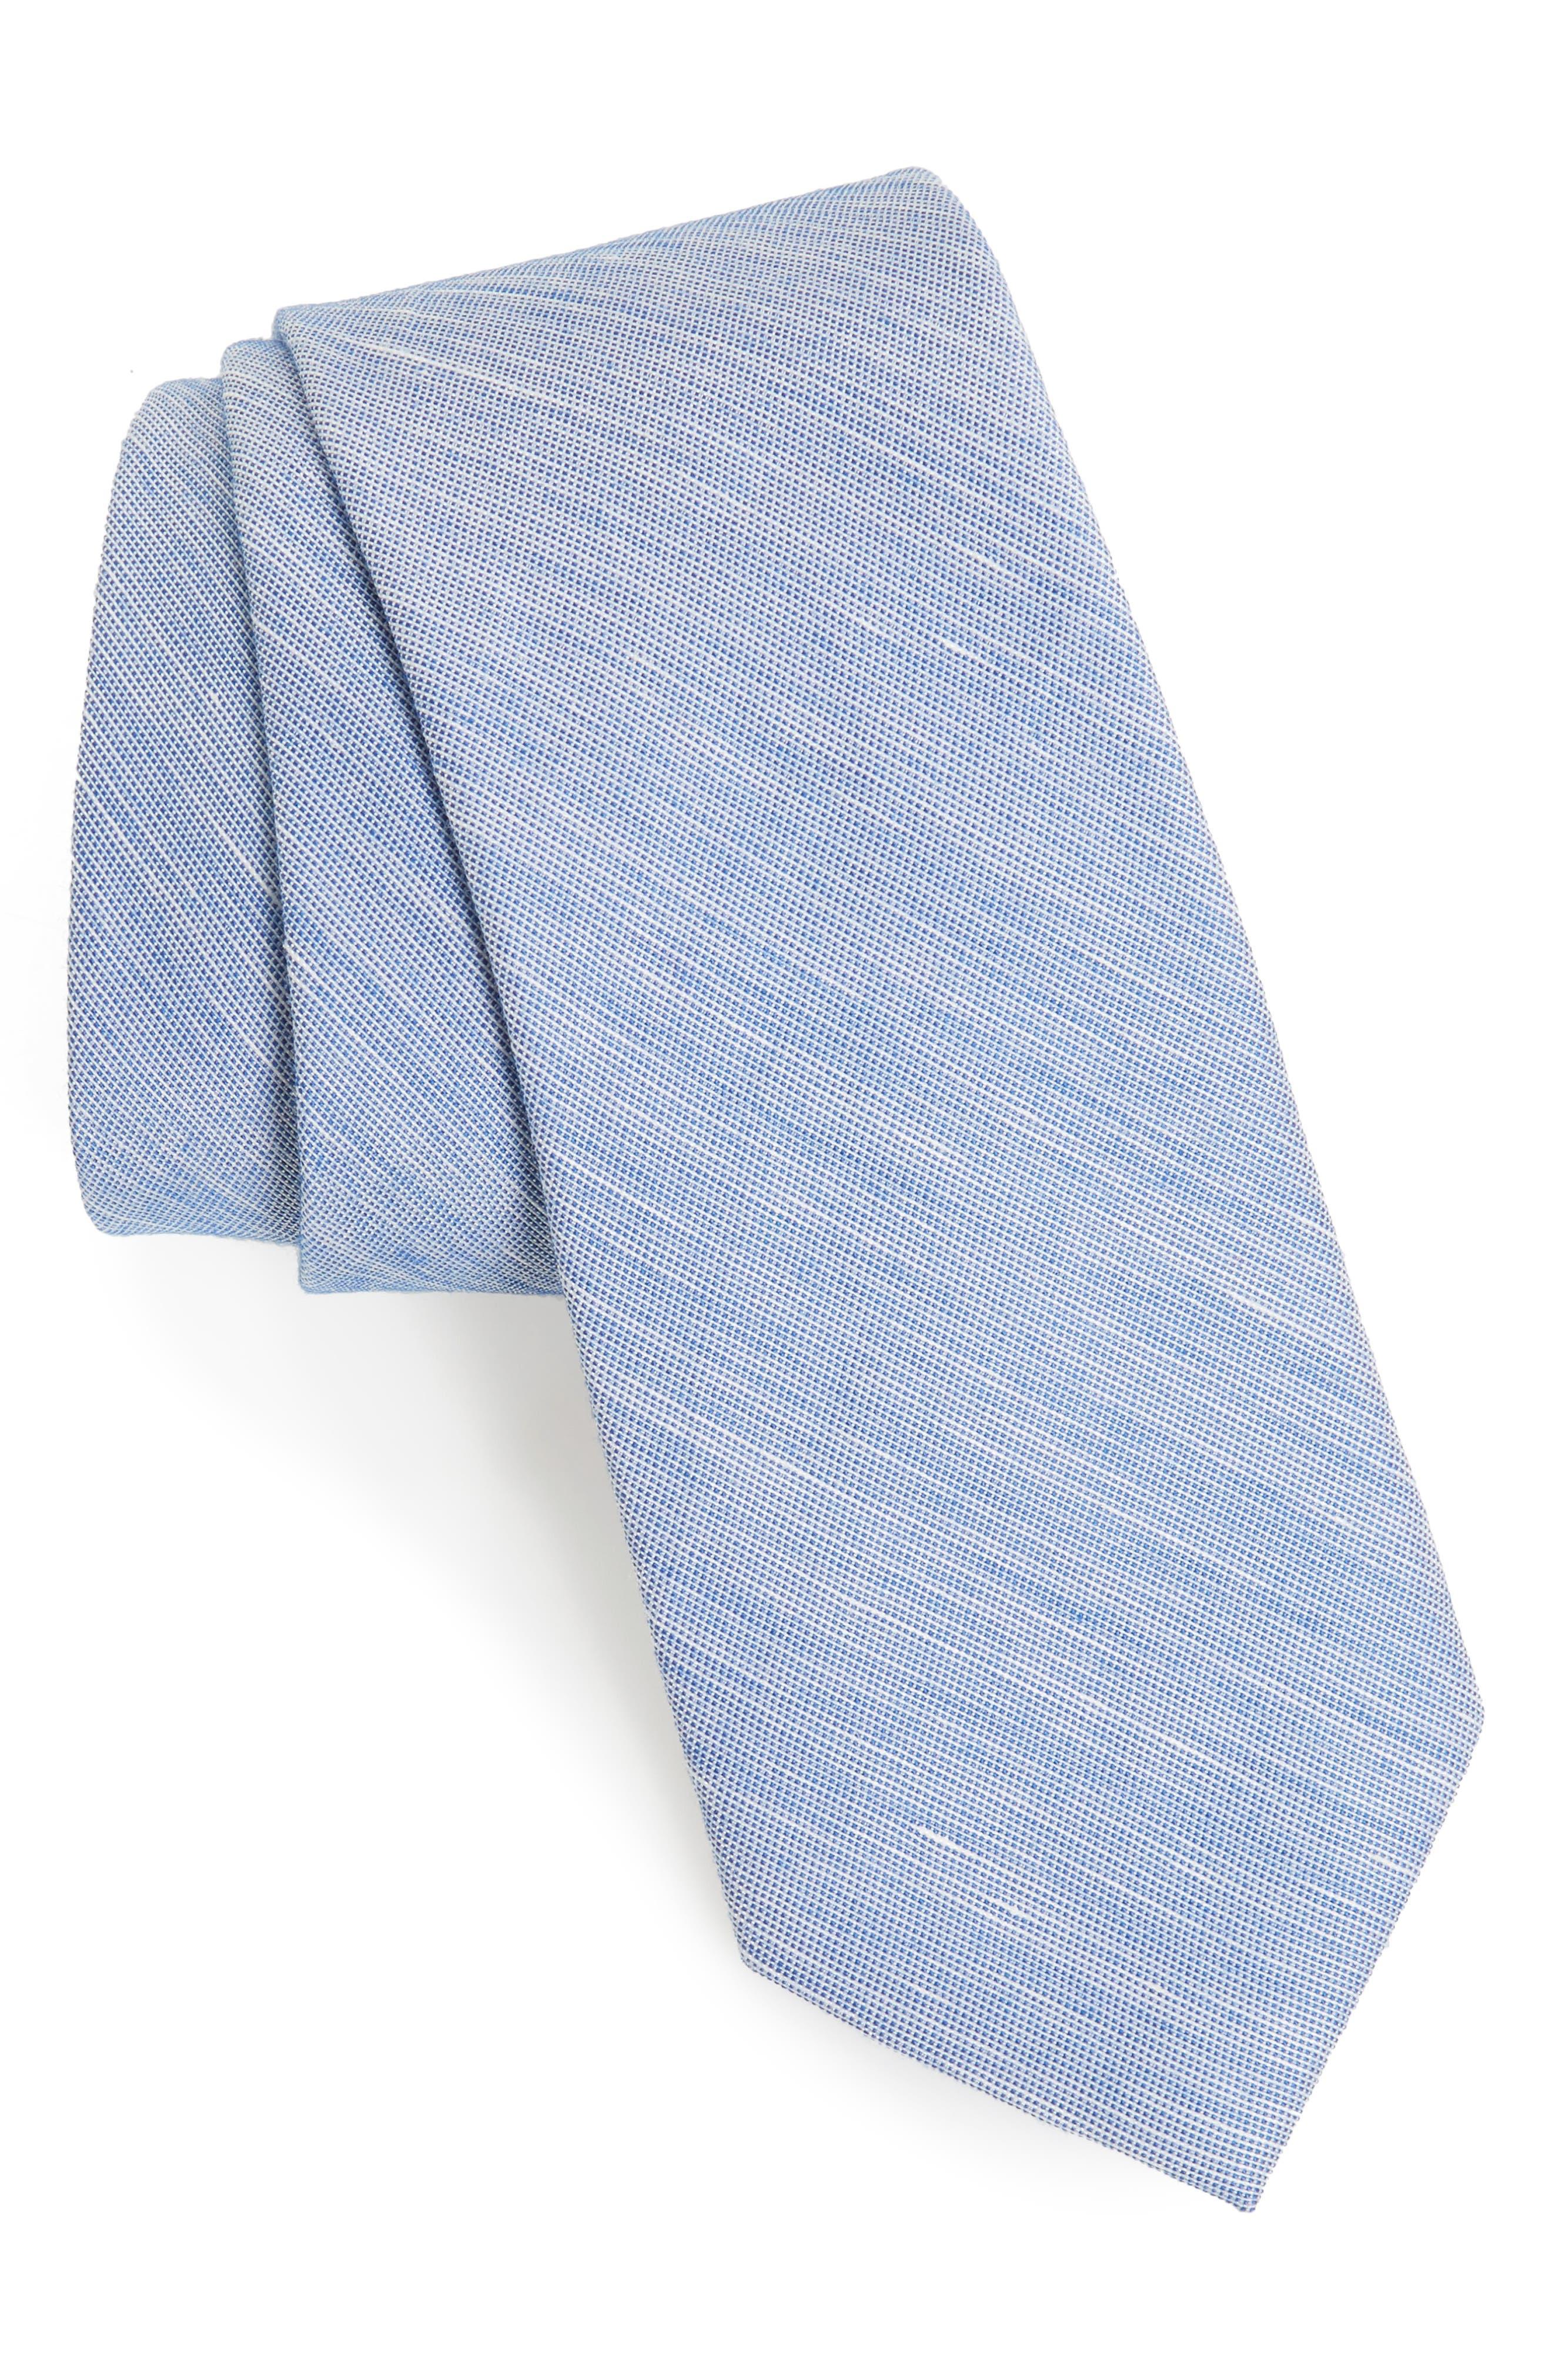 Adena Solid Silk Blend Skinny Tie,                             Main thumbnail 3, color,